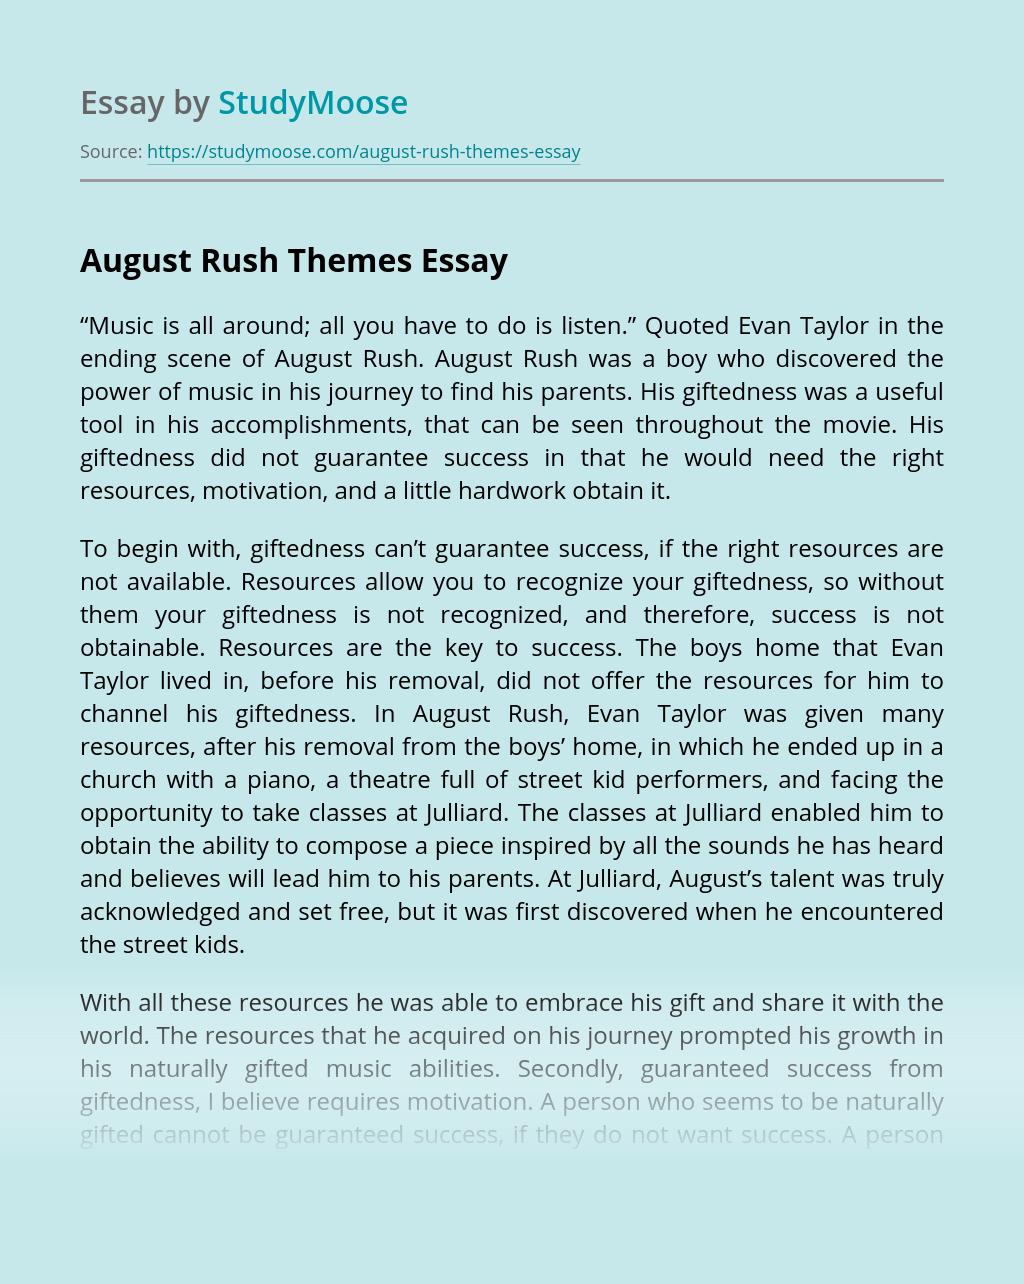 August Rush Themes